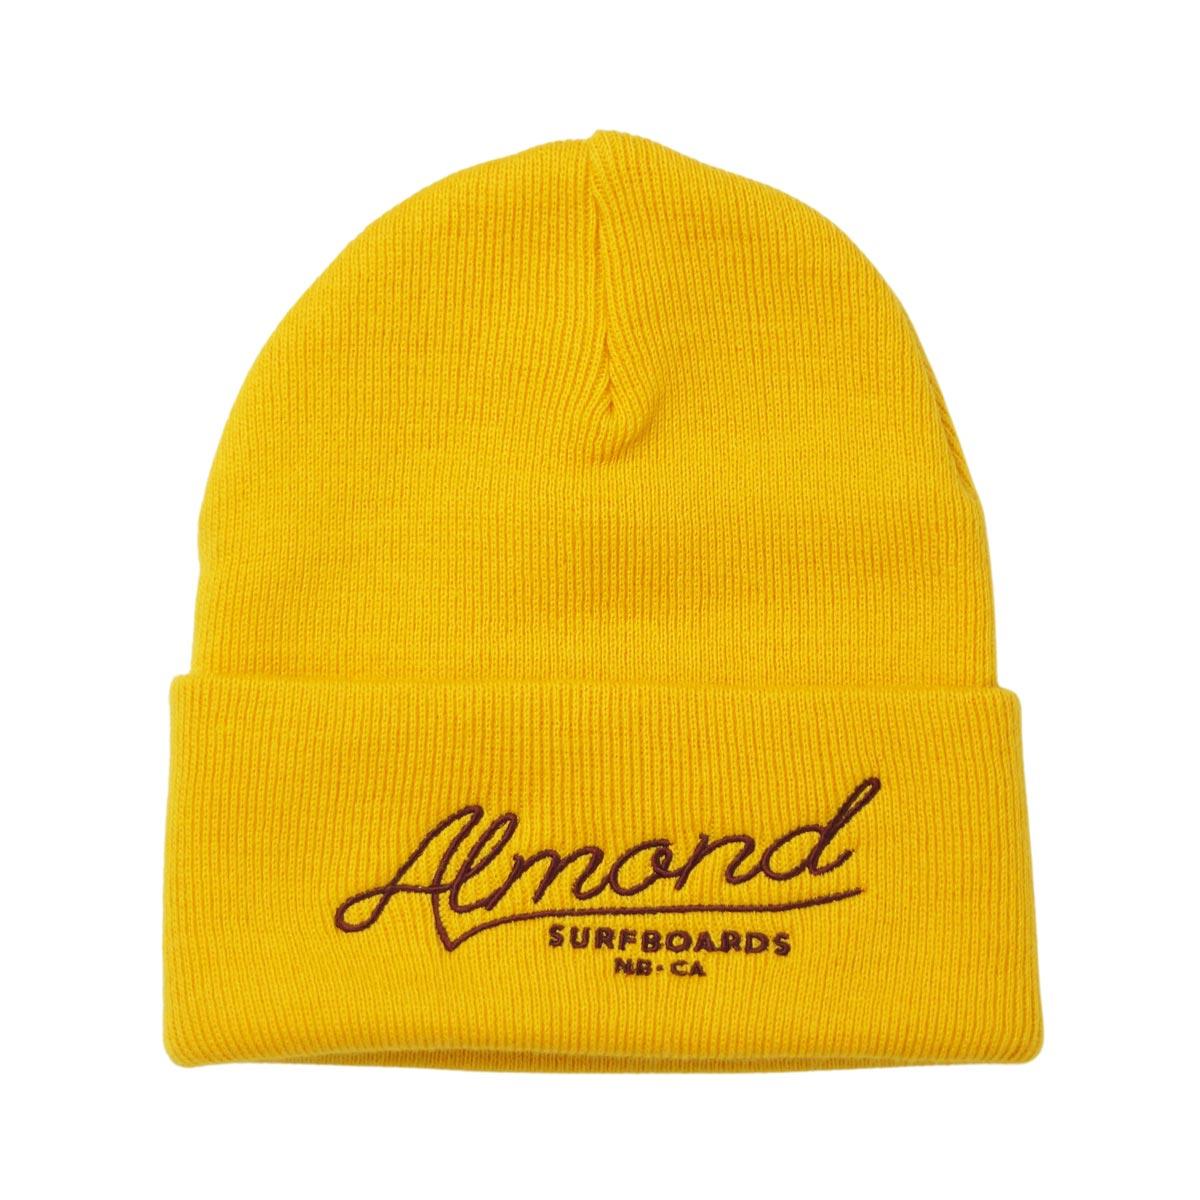 Almond Surf アーモンドサーフボードデザイン HICKORY SCRIPT BEANIE